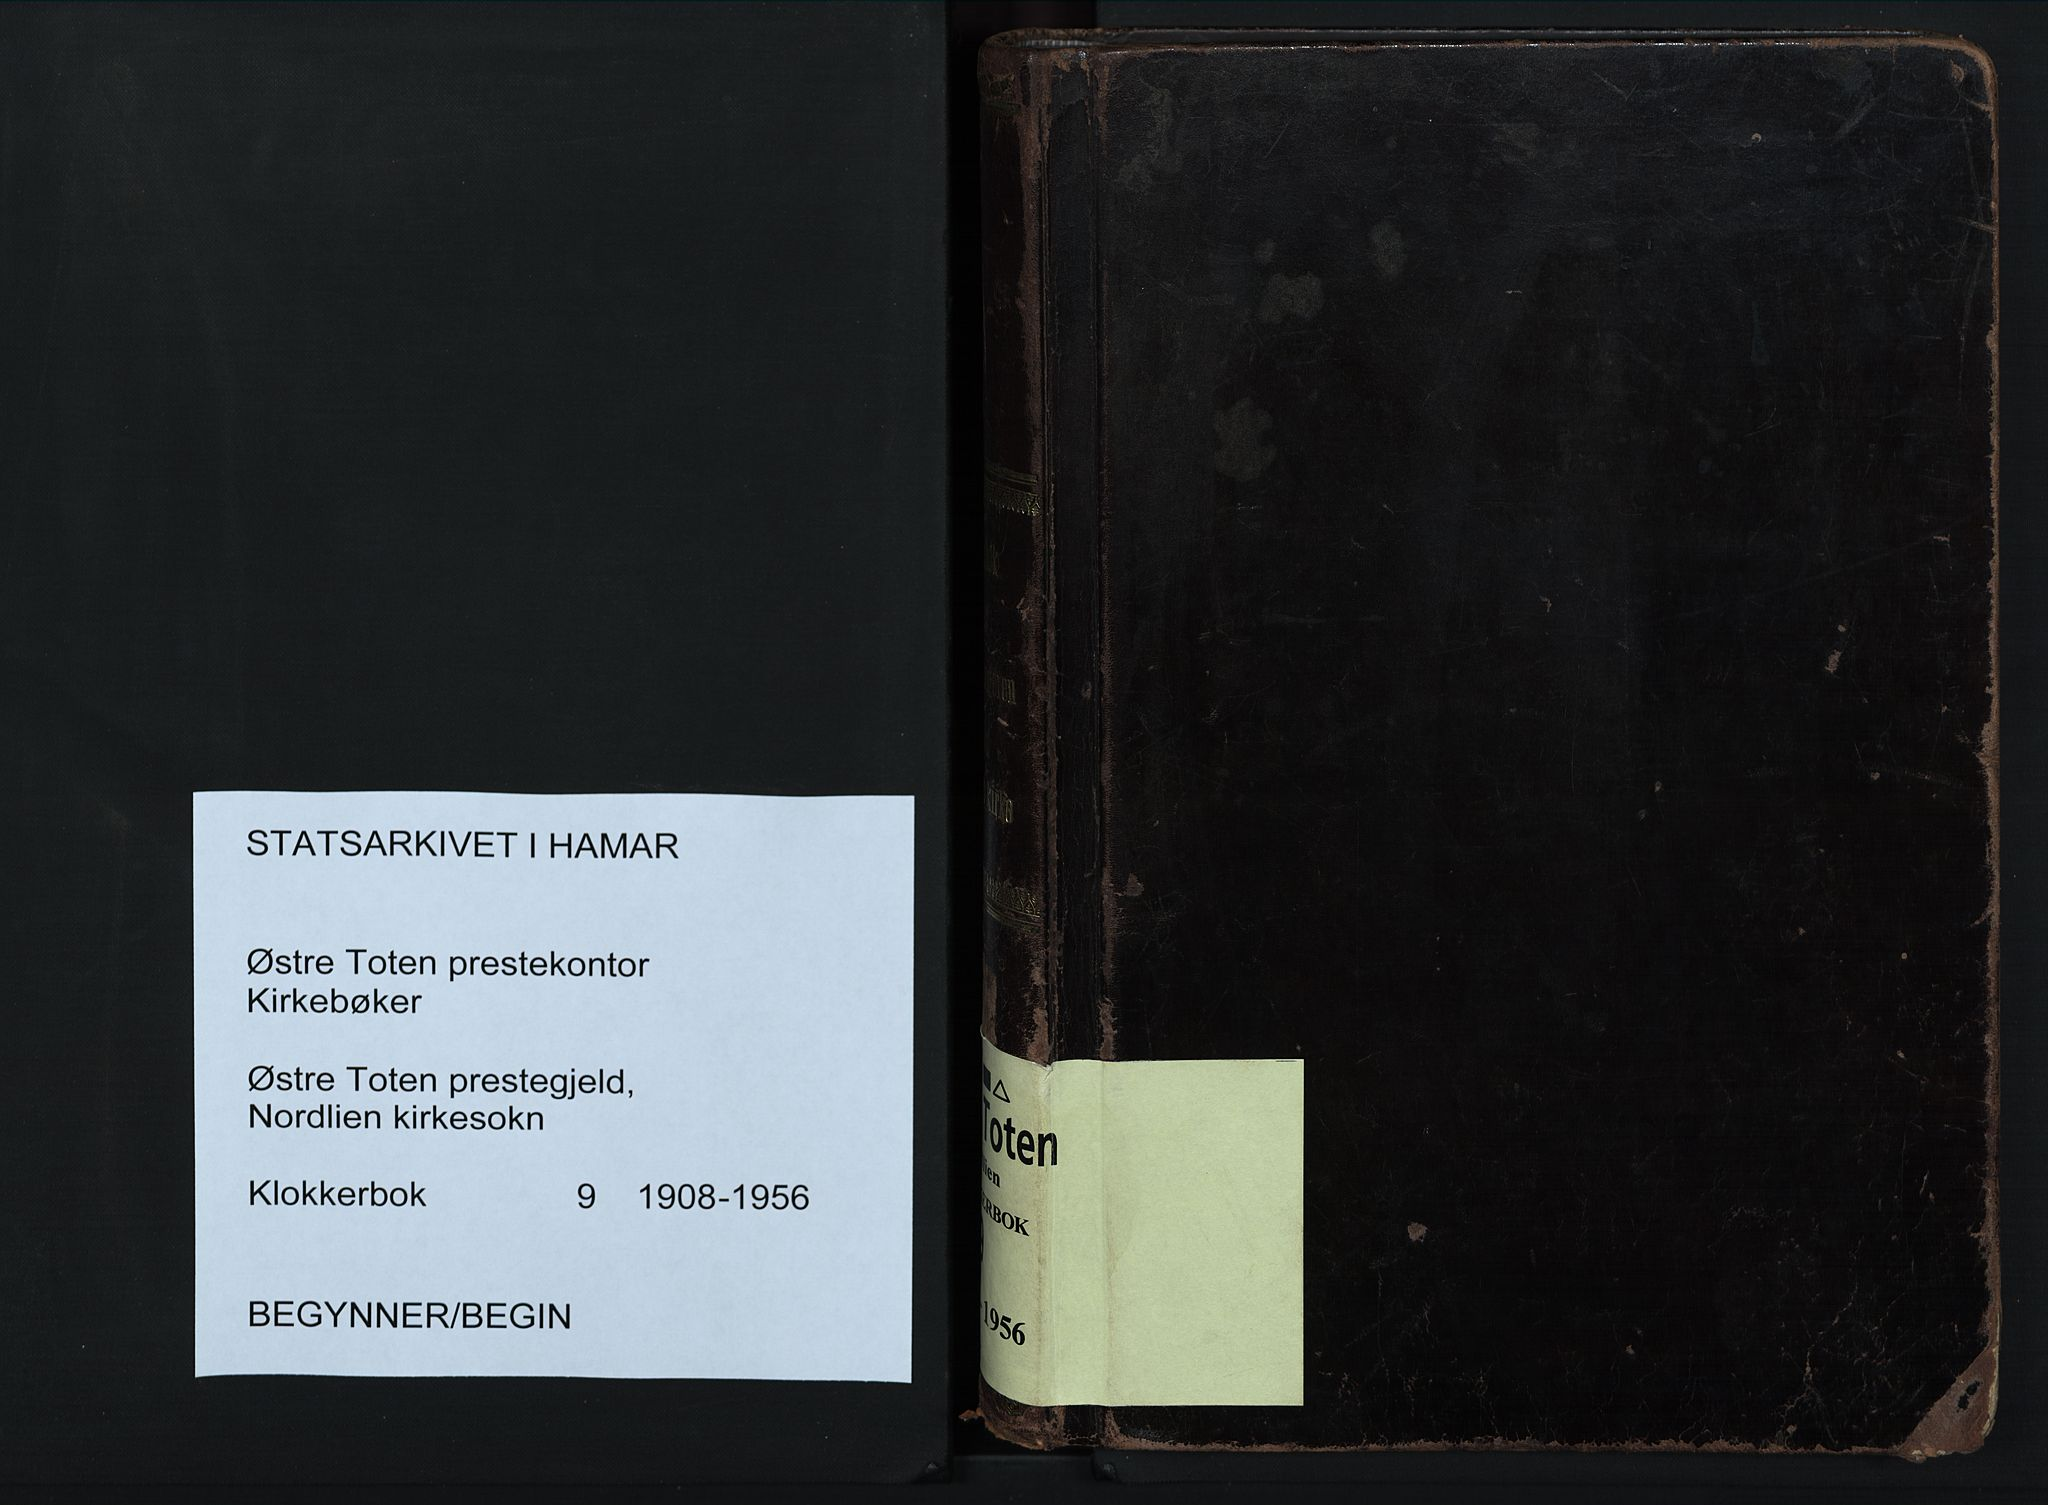 SAH, Østre Toten prestekontor, Klokkerbok nr. 9, 1908-1956